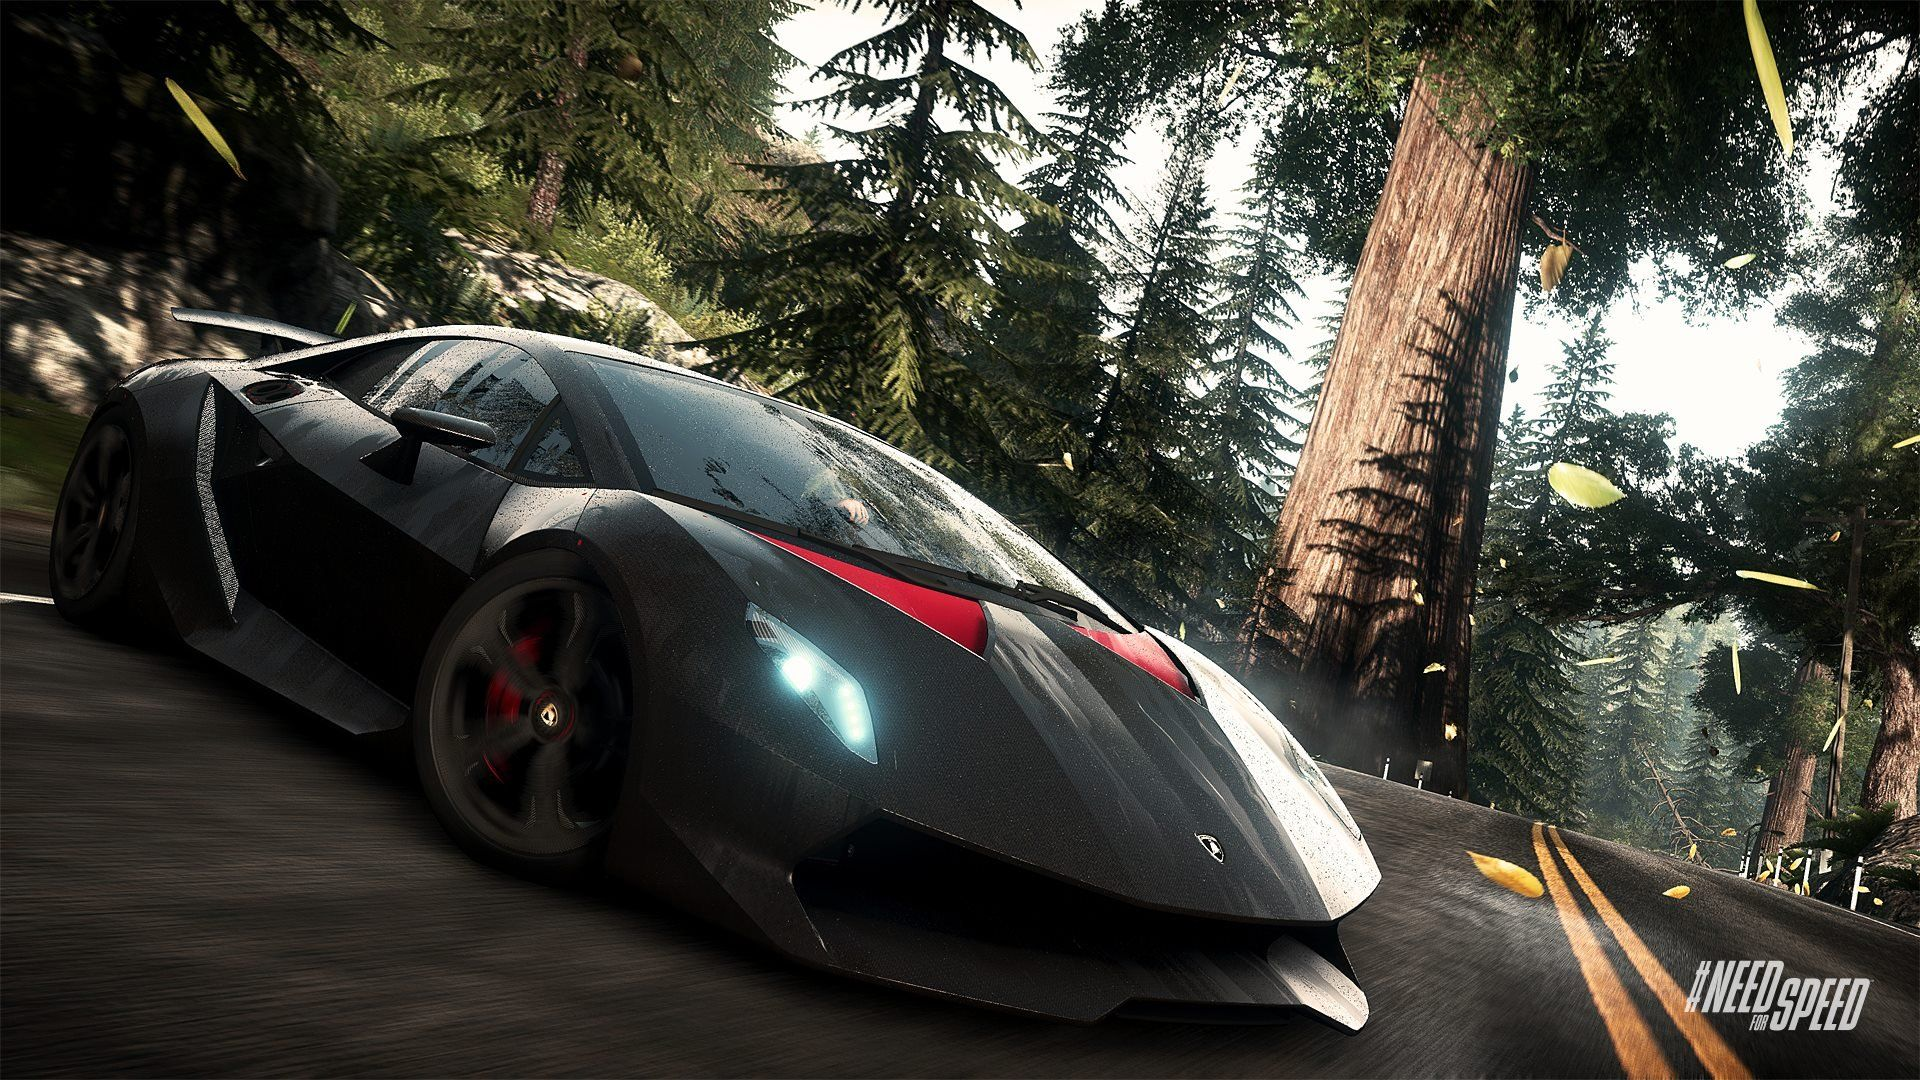 K Ultra Hd Need For Speed Wallpapers Hd Desktop Backgrounds